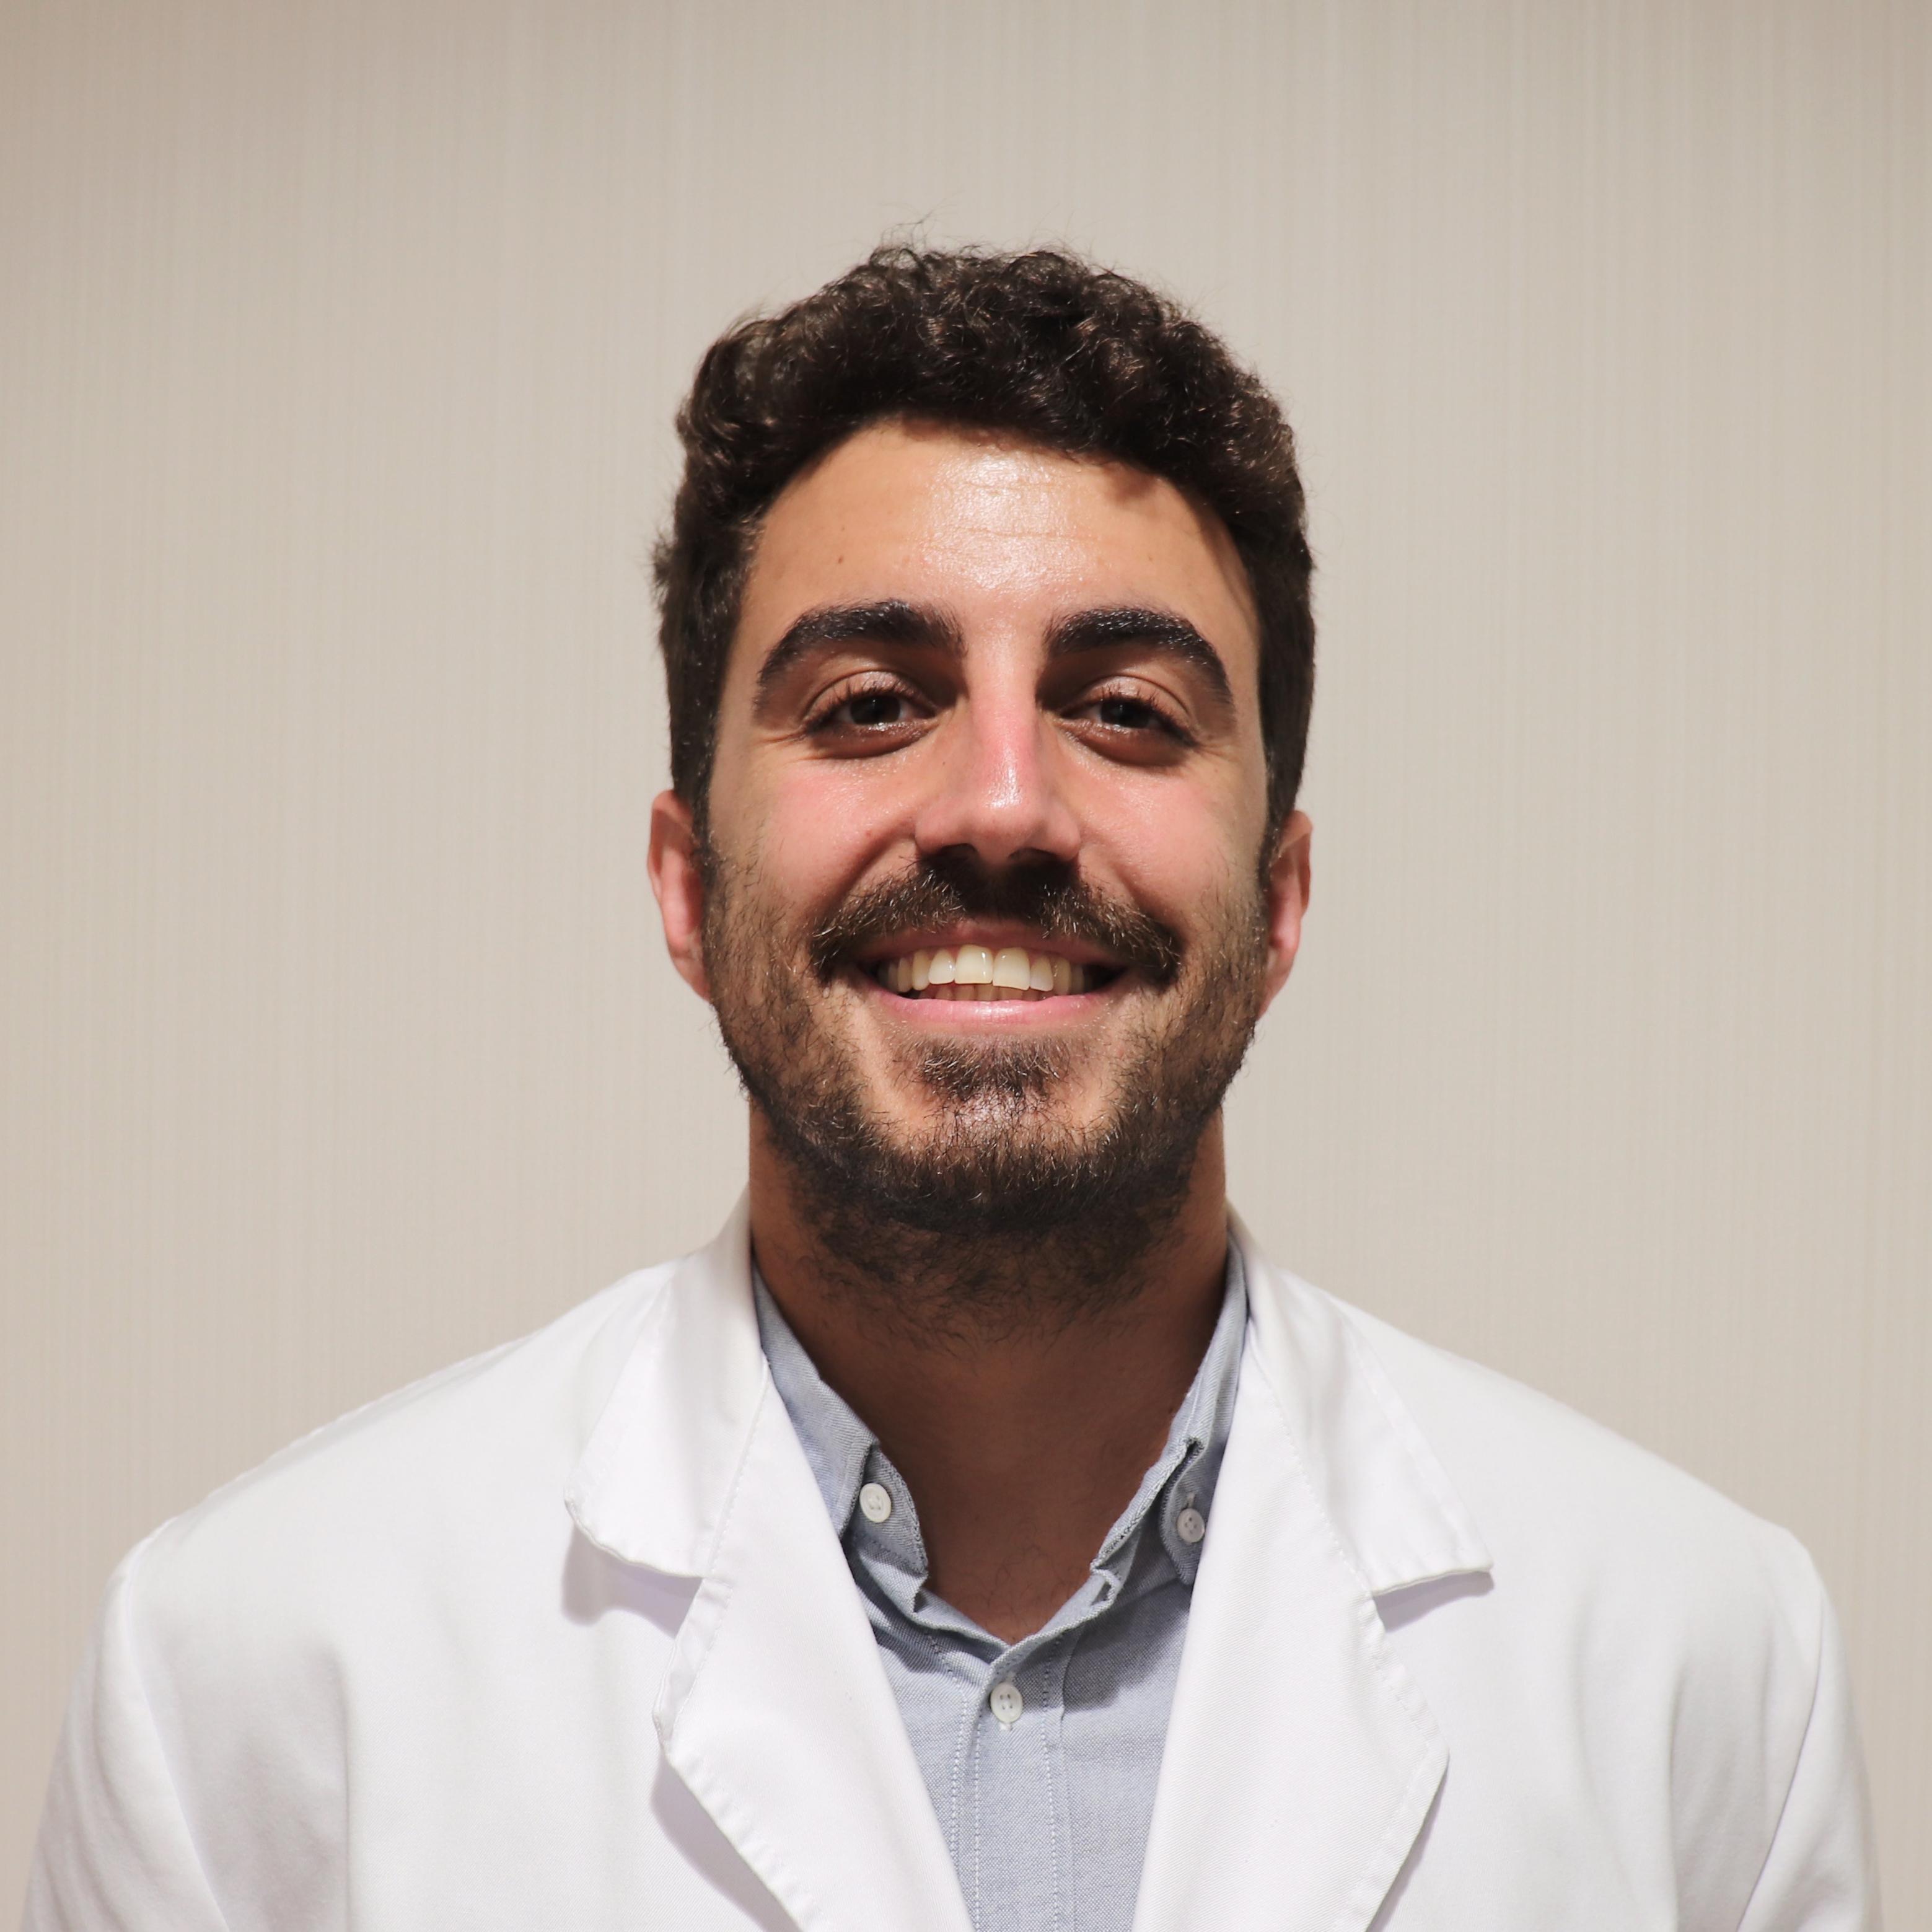 Luis Peña Ferrera